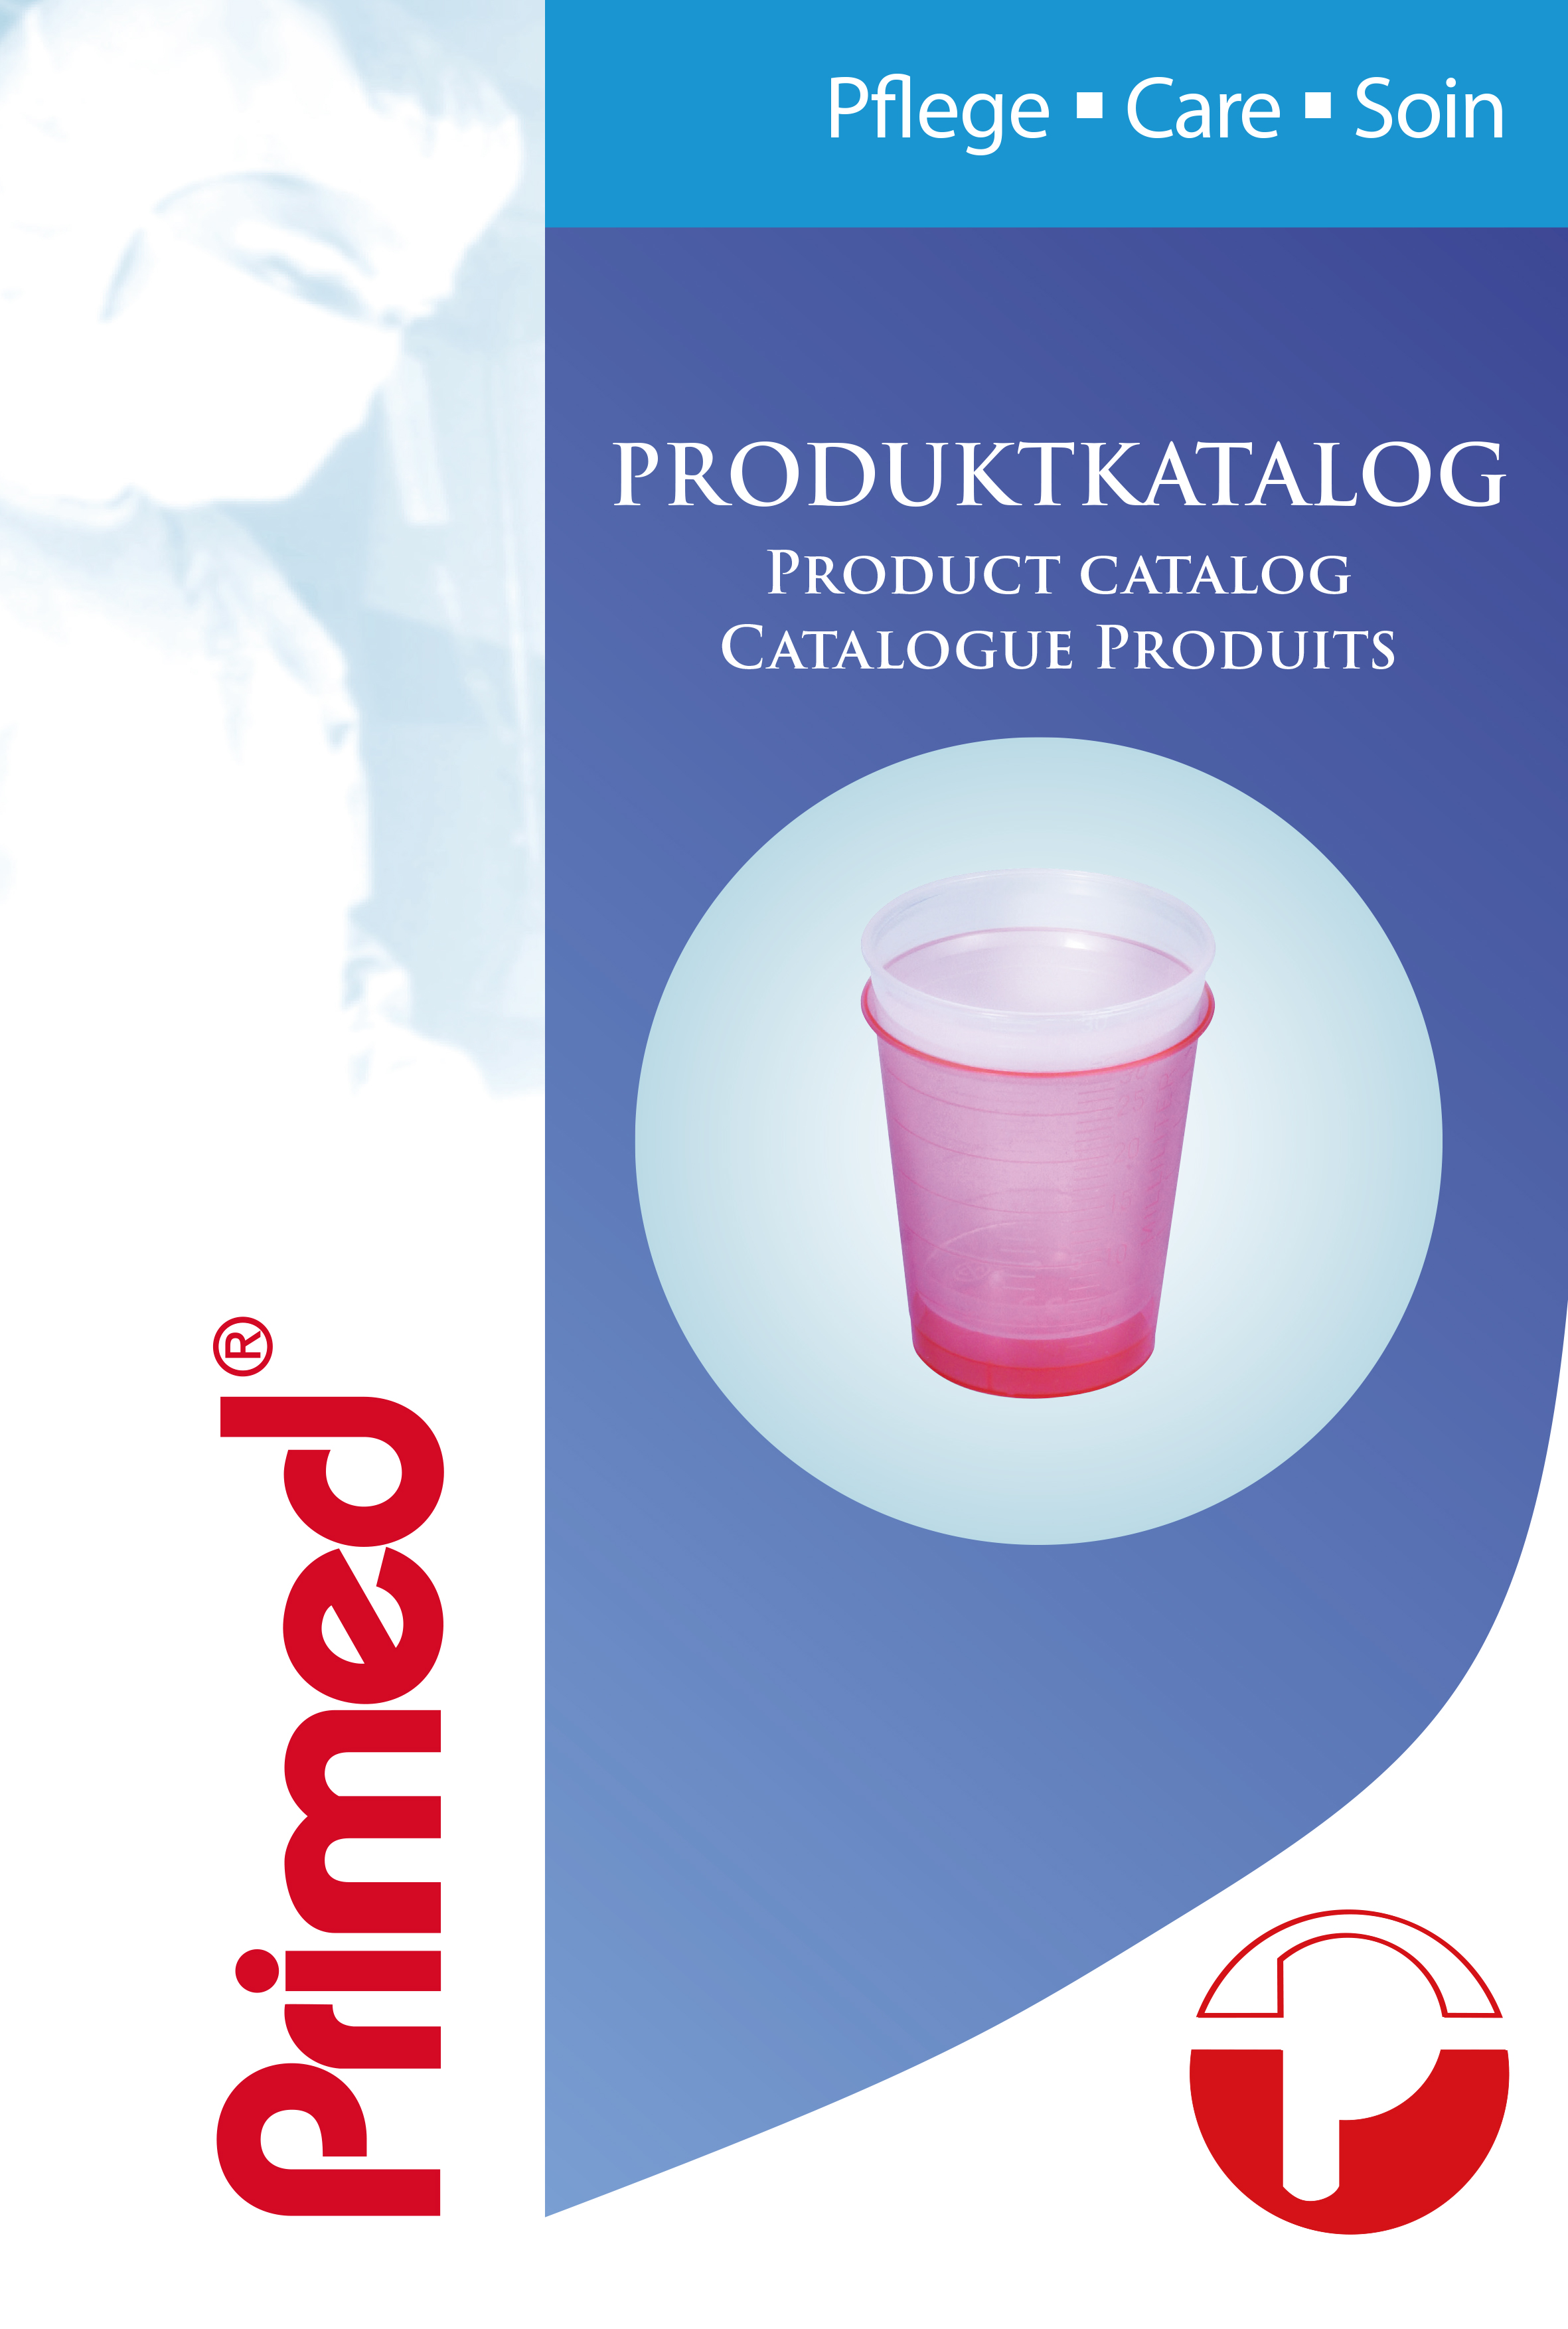 Katalog Pflegeprodukte